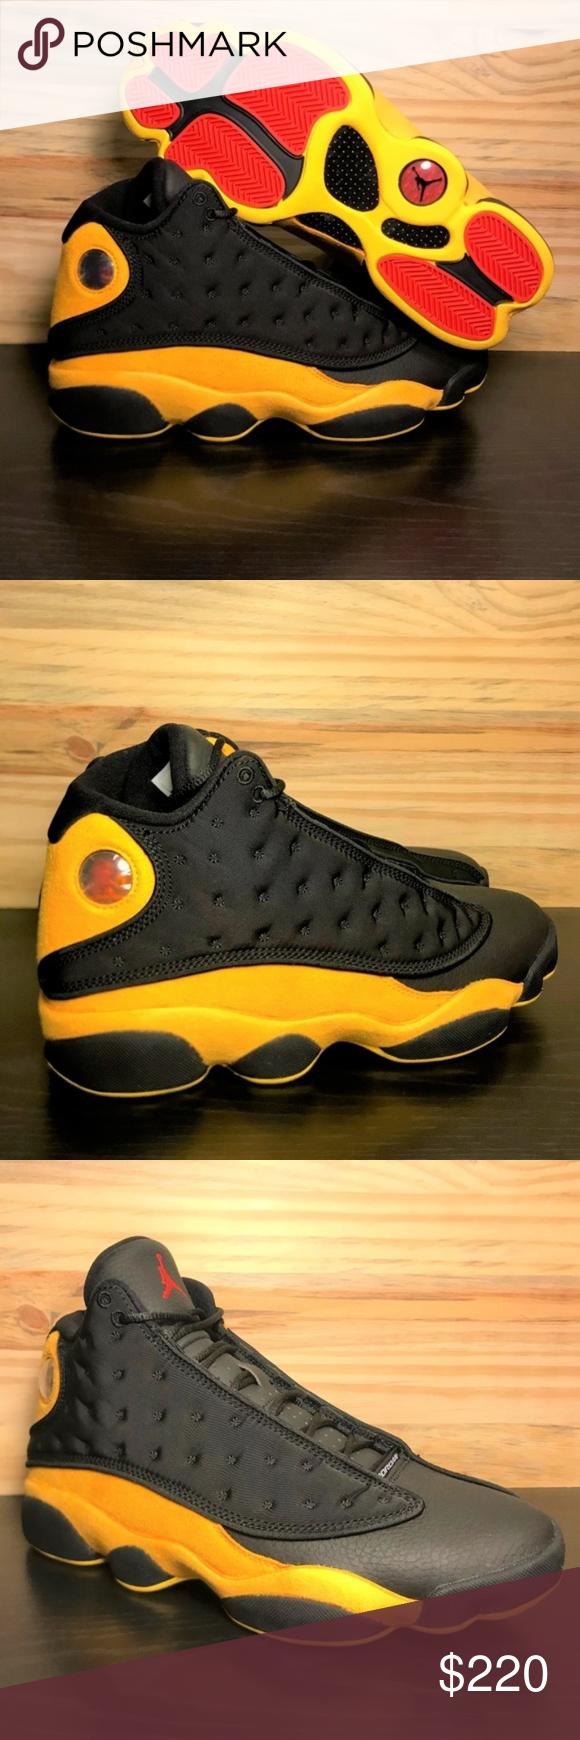 wholesale dealer 4cfb3 b246d New Nike Air Jordan 13 Retro Carmelo Anthony 2002 Brand new ...